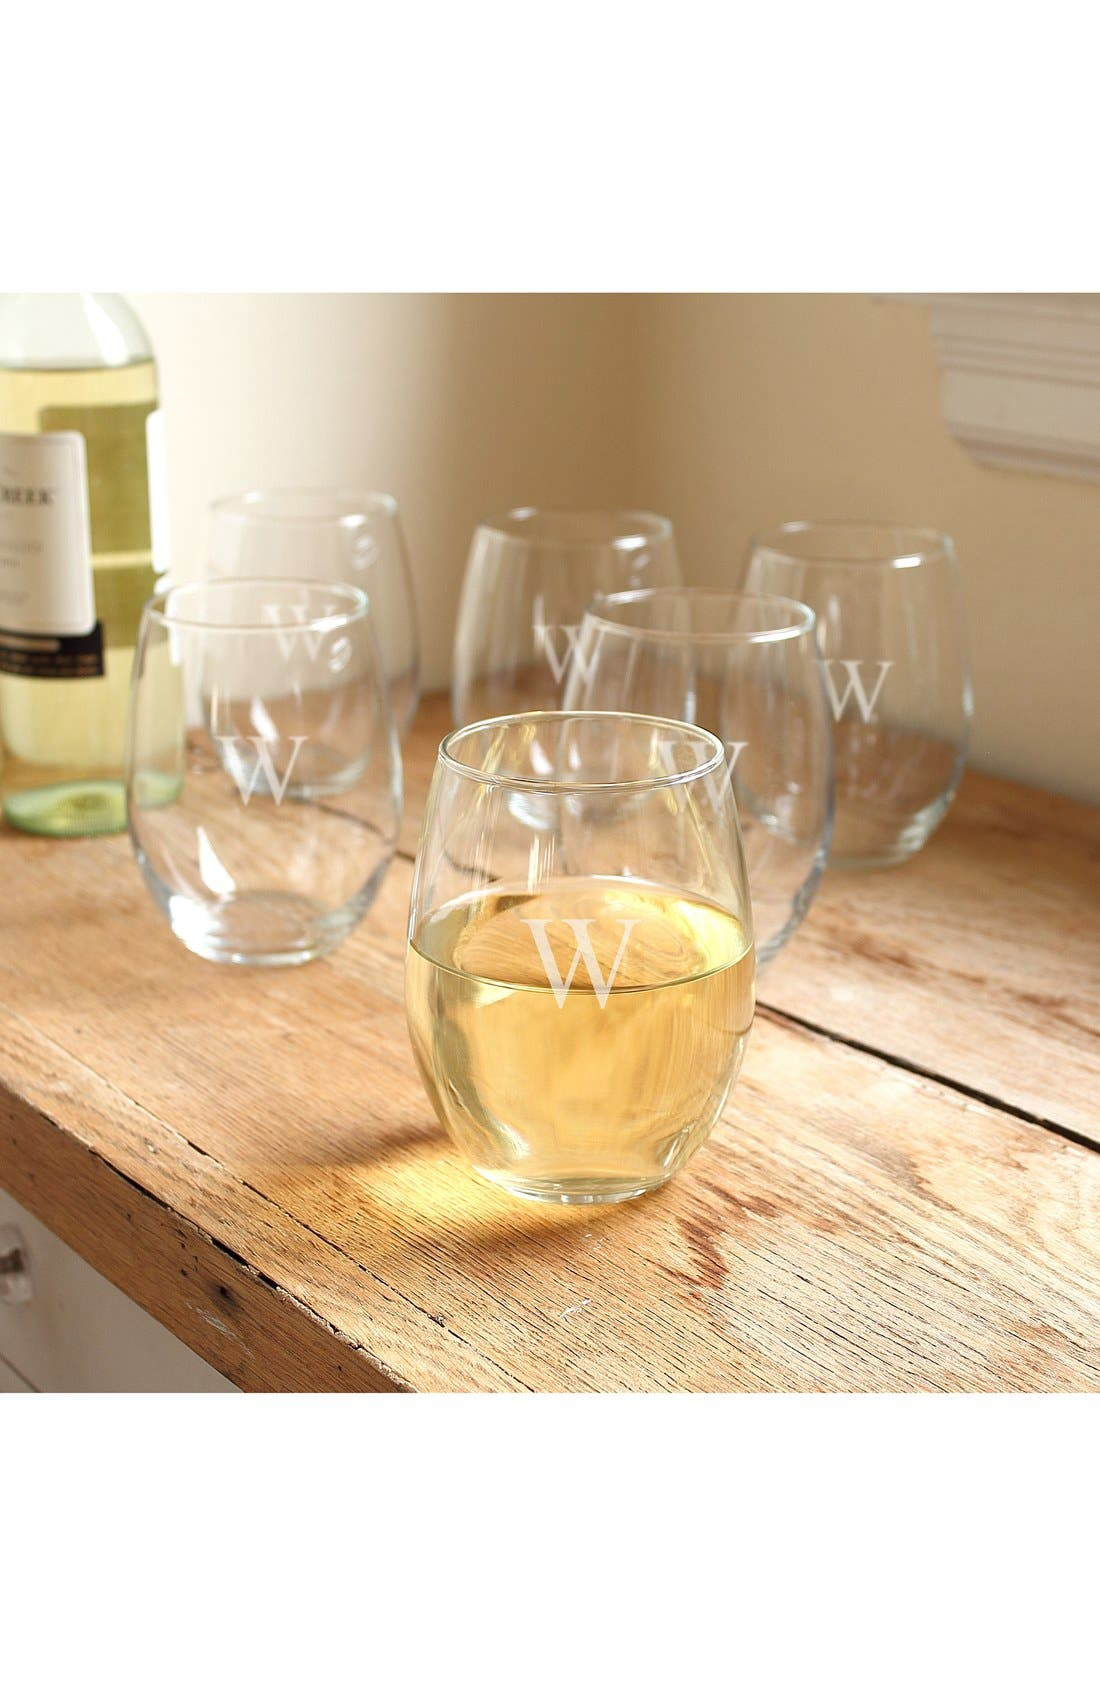 Set of 6 Monogram Stemless Wine Glasses,                             Main thumbnail 1, color,                             W